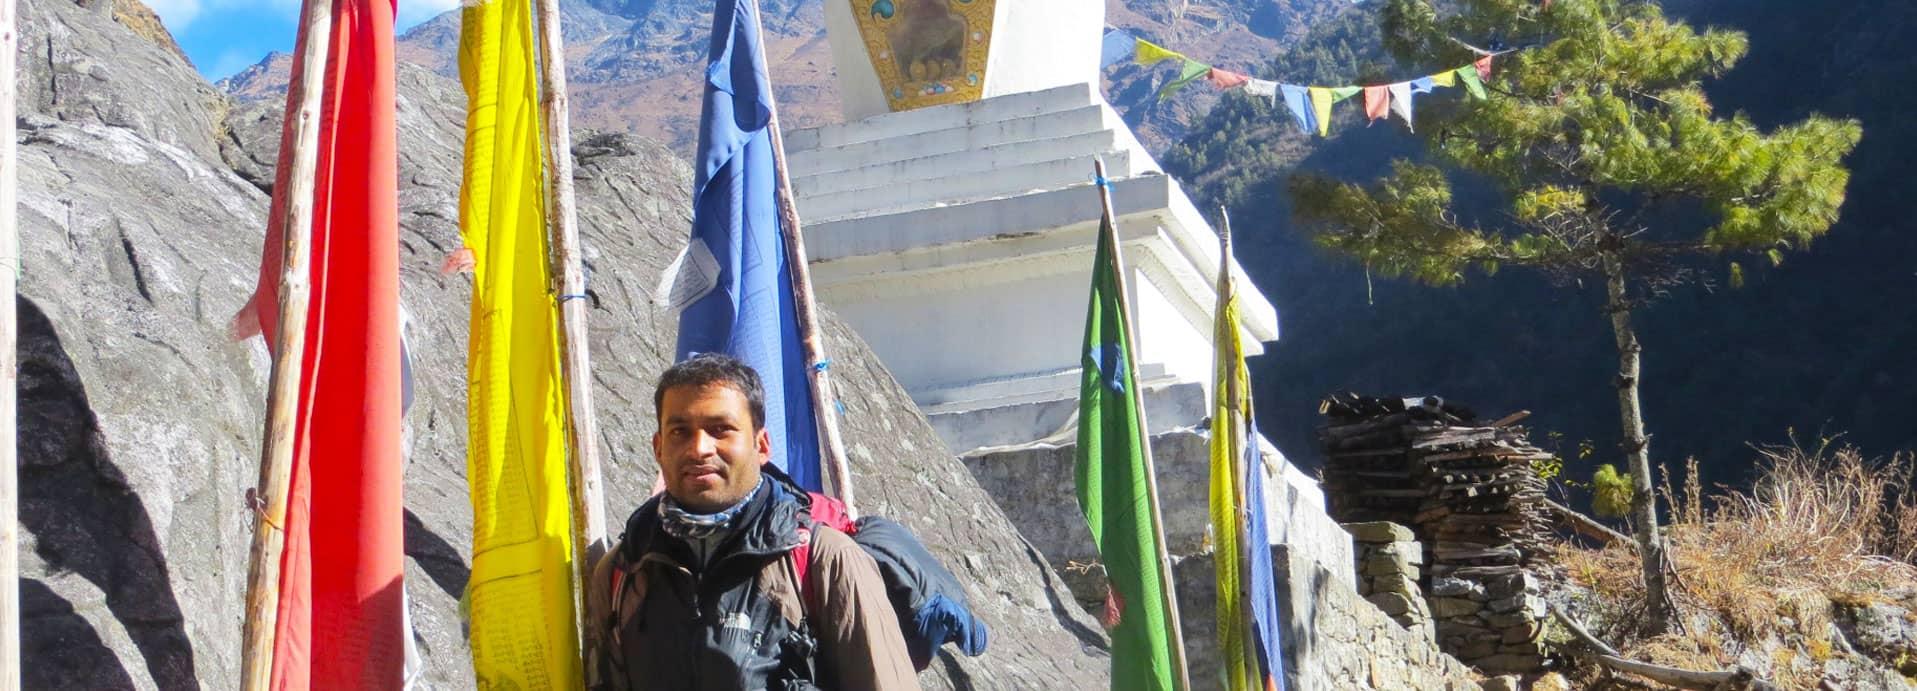 Phaplu Everest Base Camp Hiking